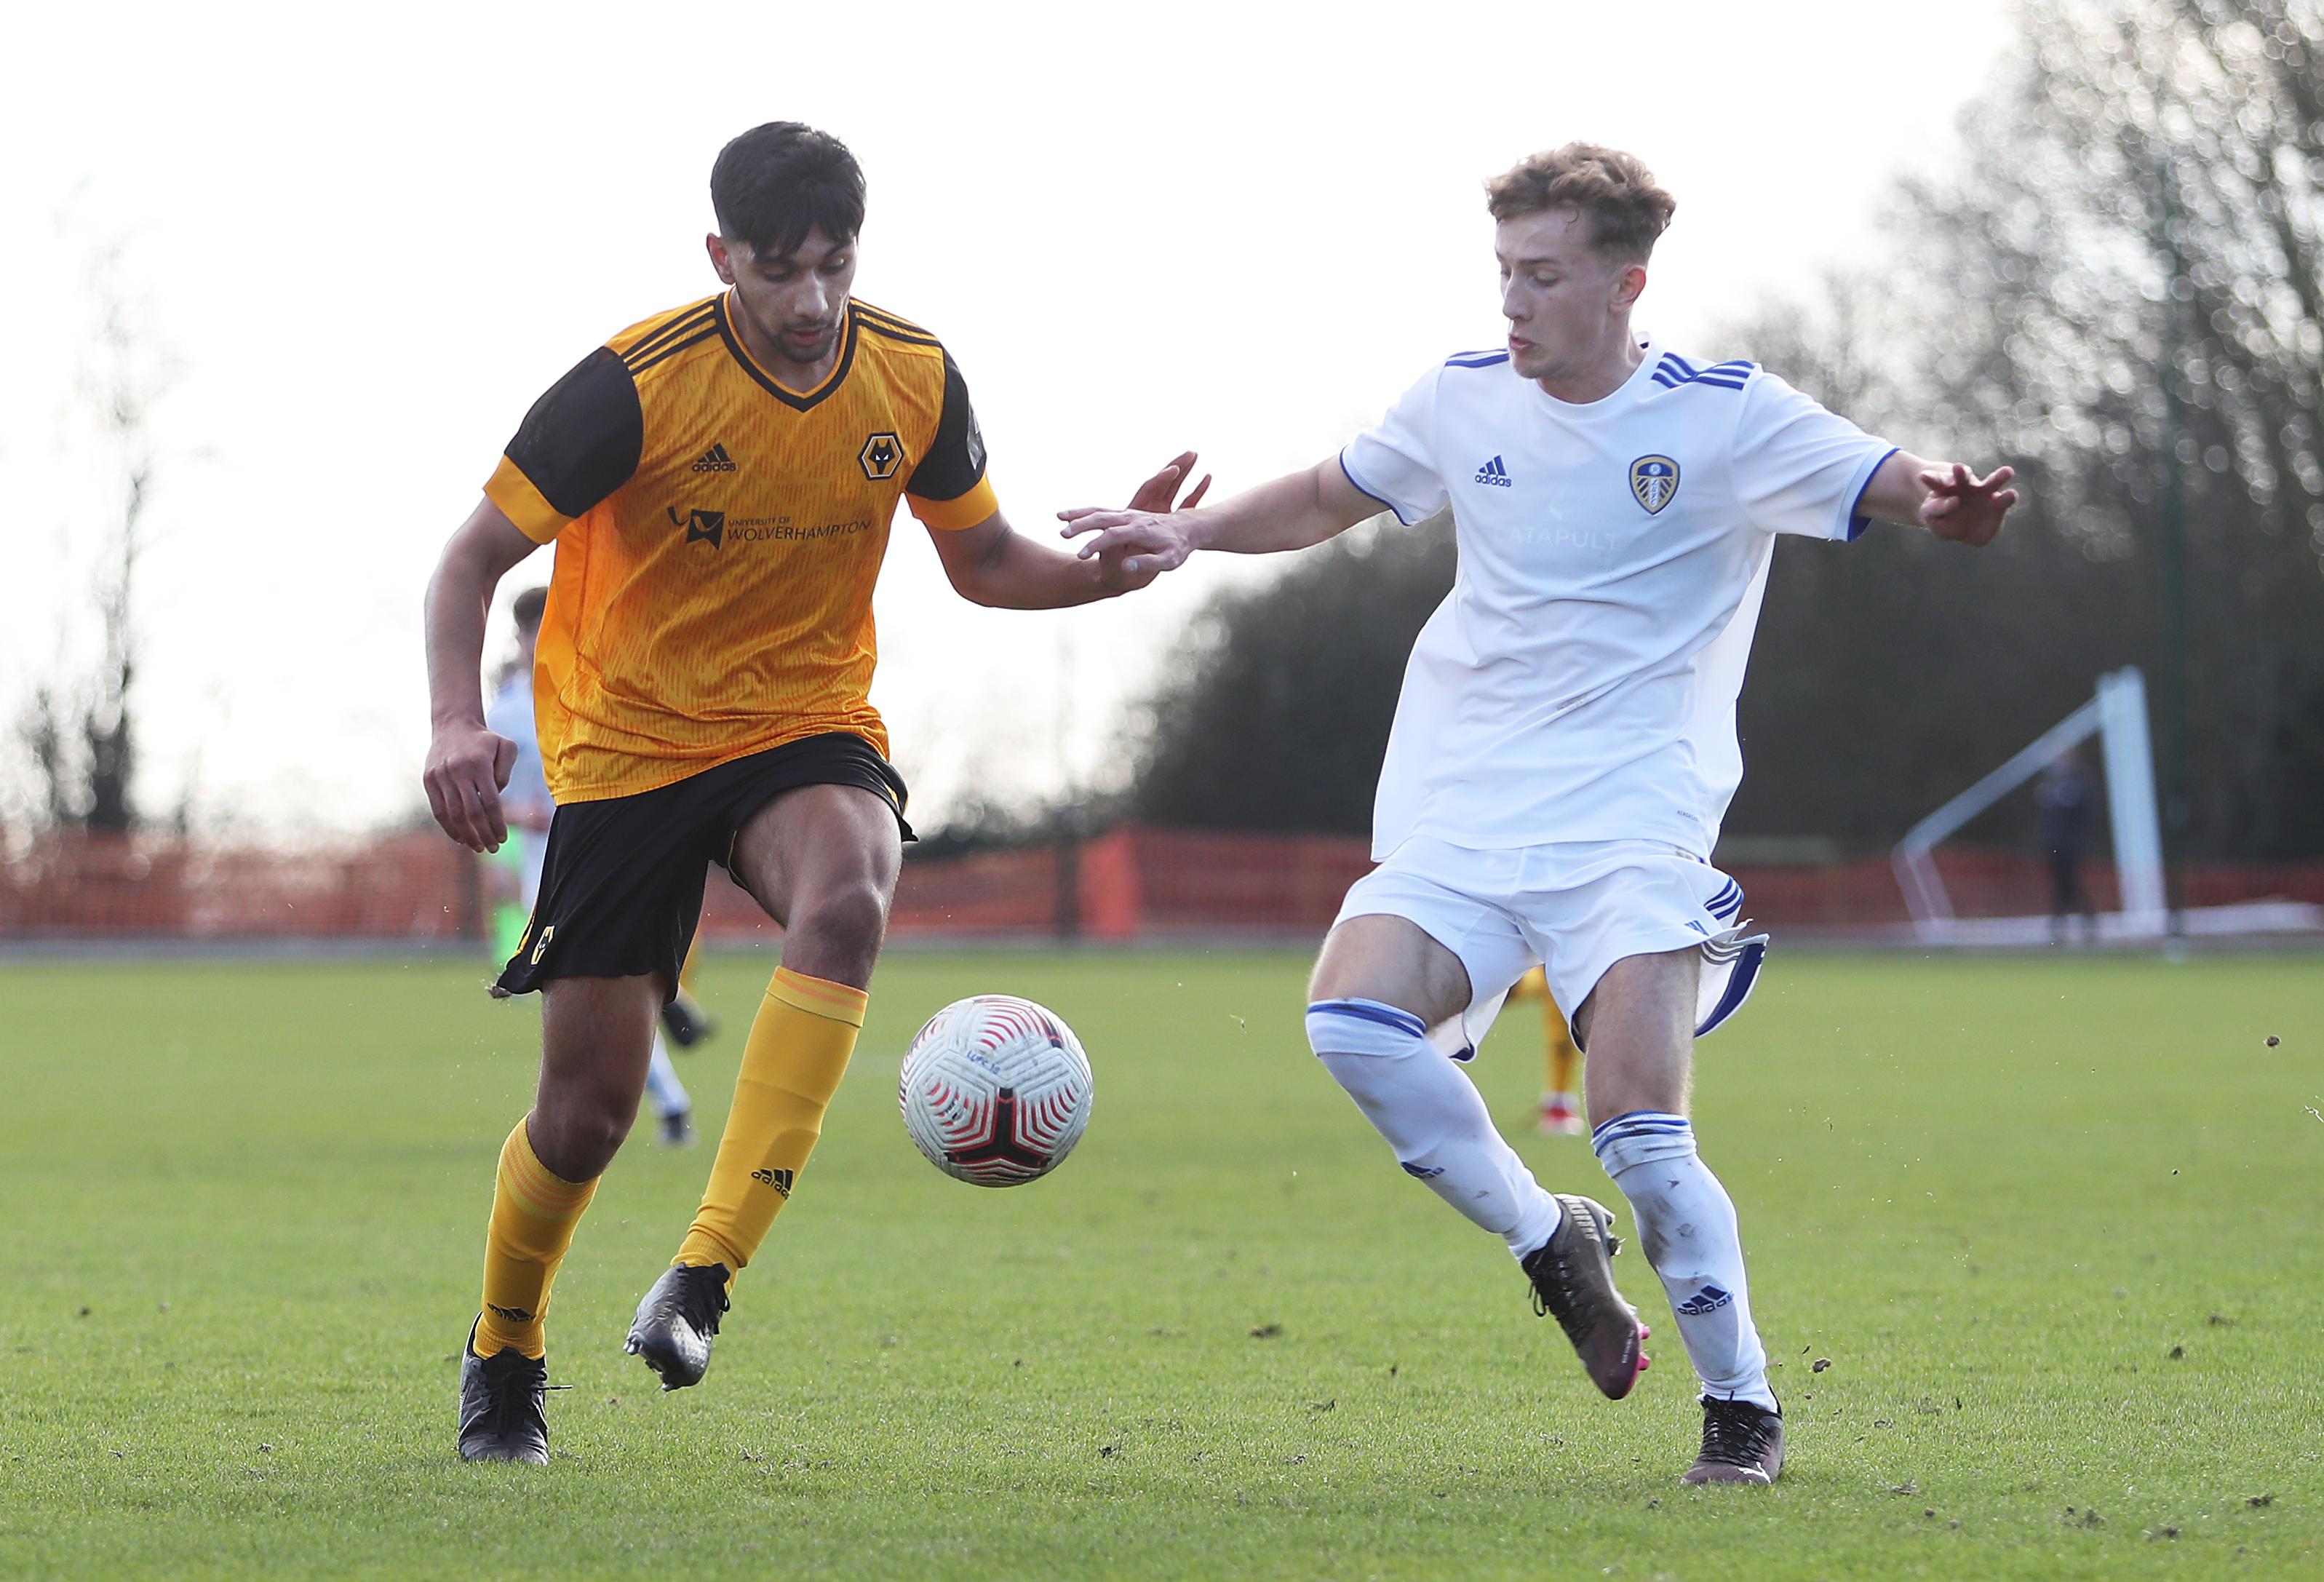 Leeds United v Wolverhampton Wanderers: U18 Premier League